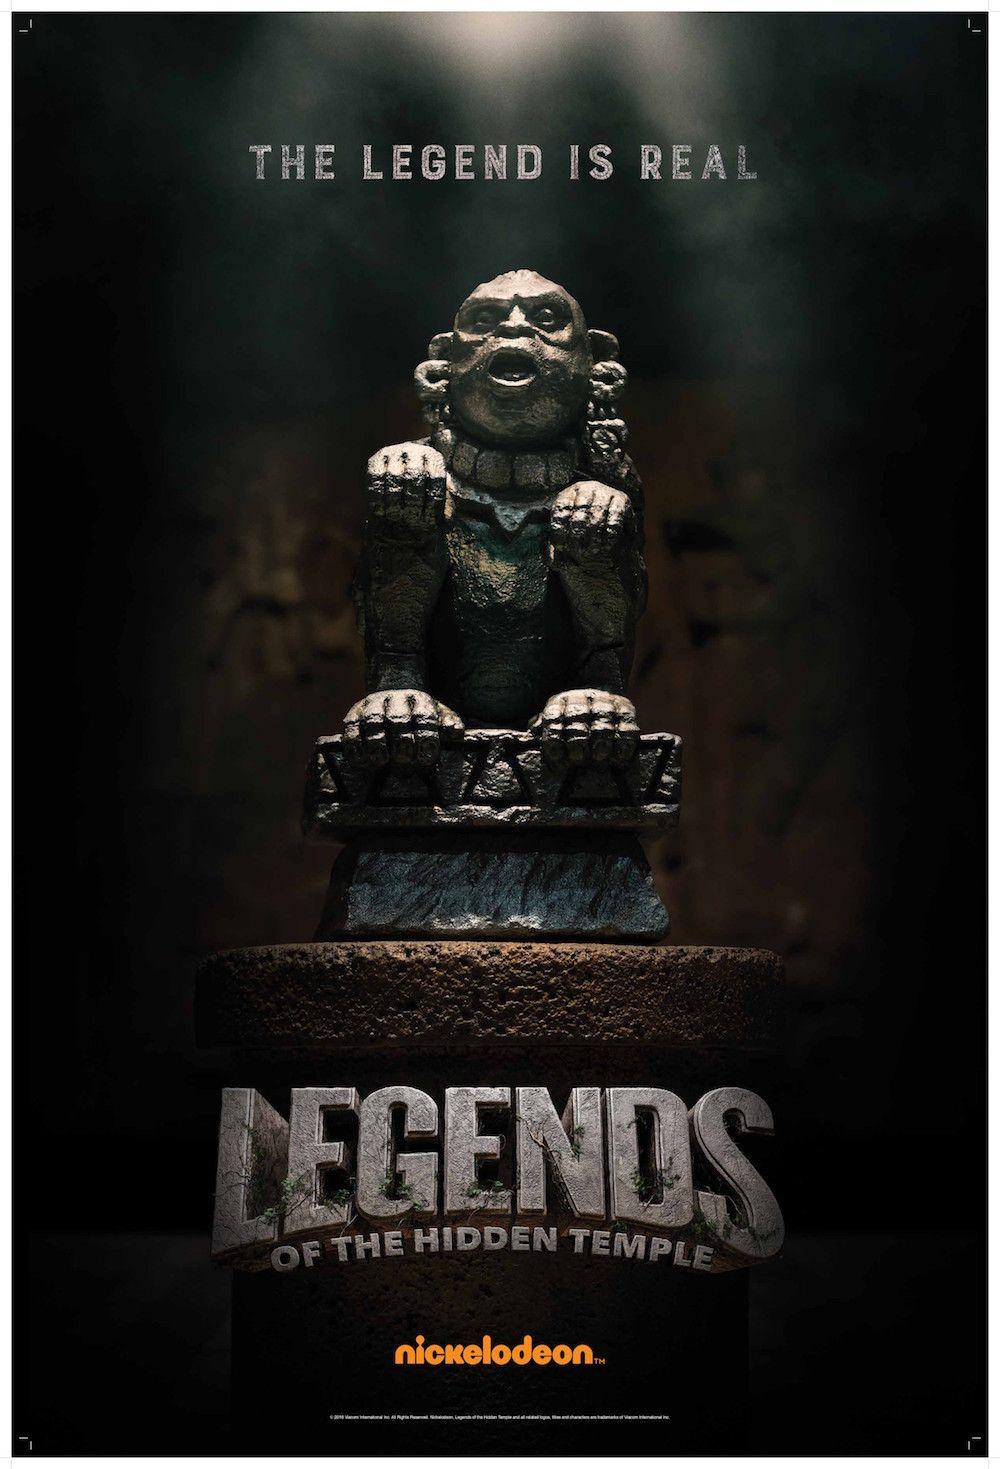 The Legend of Hercules - Wikipedia